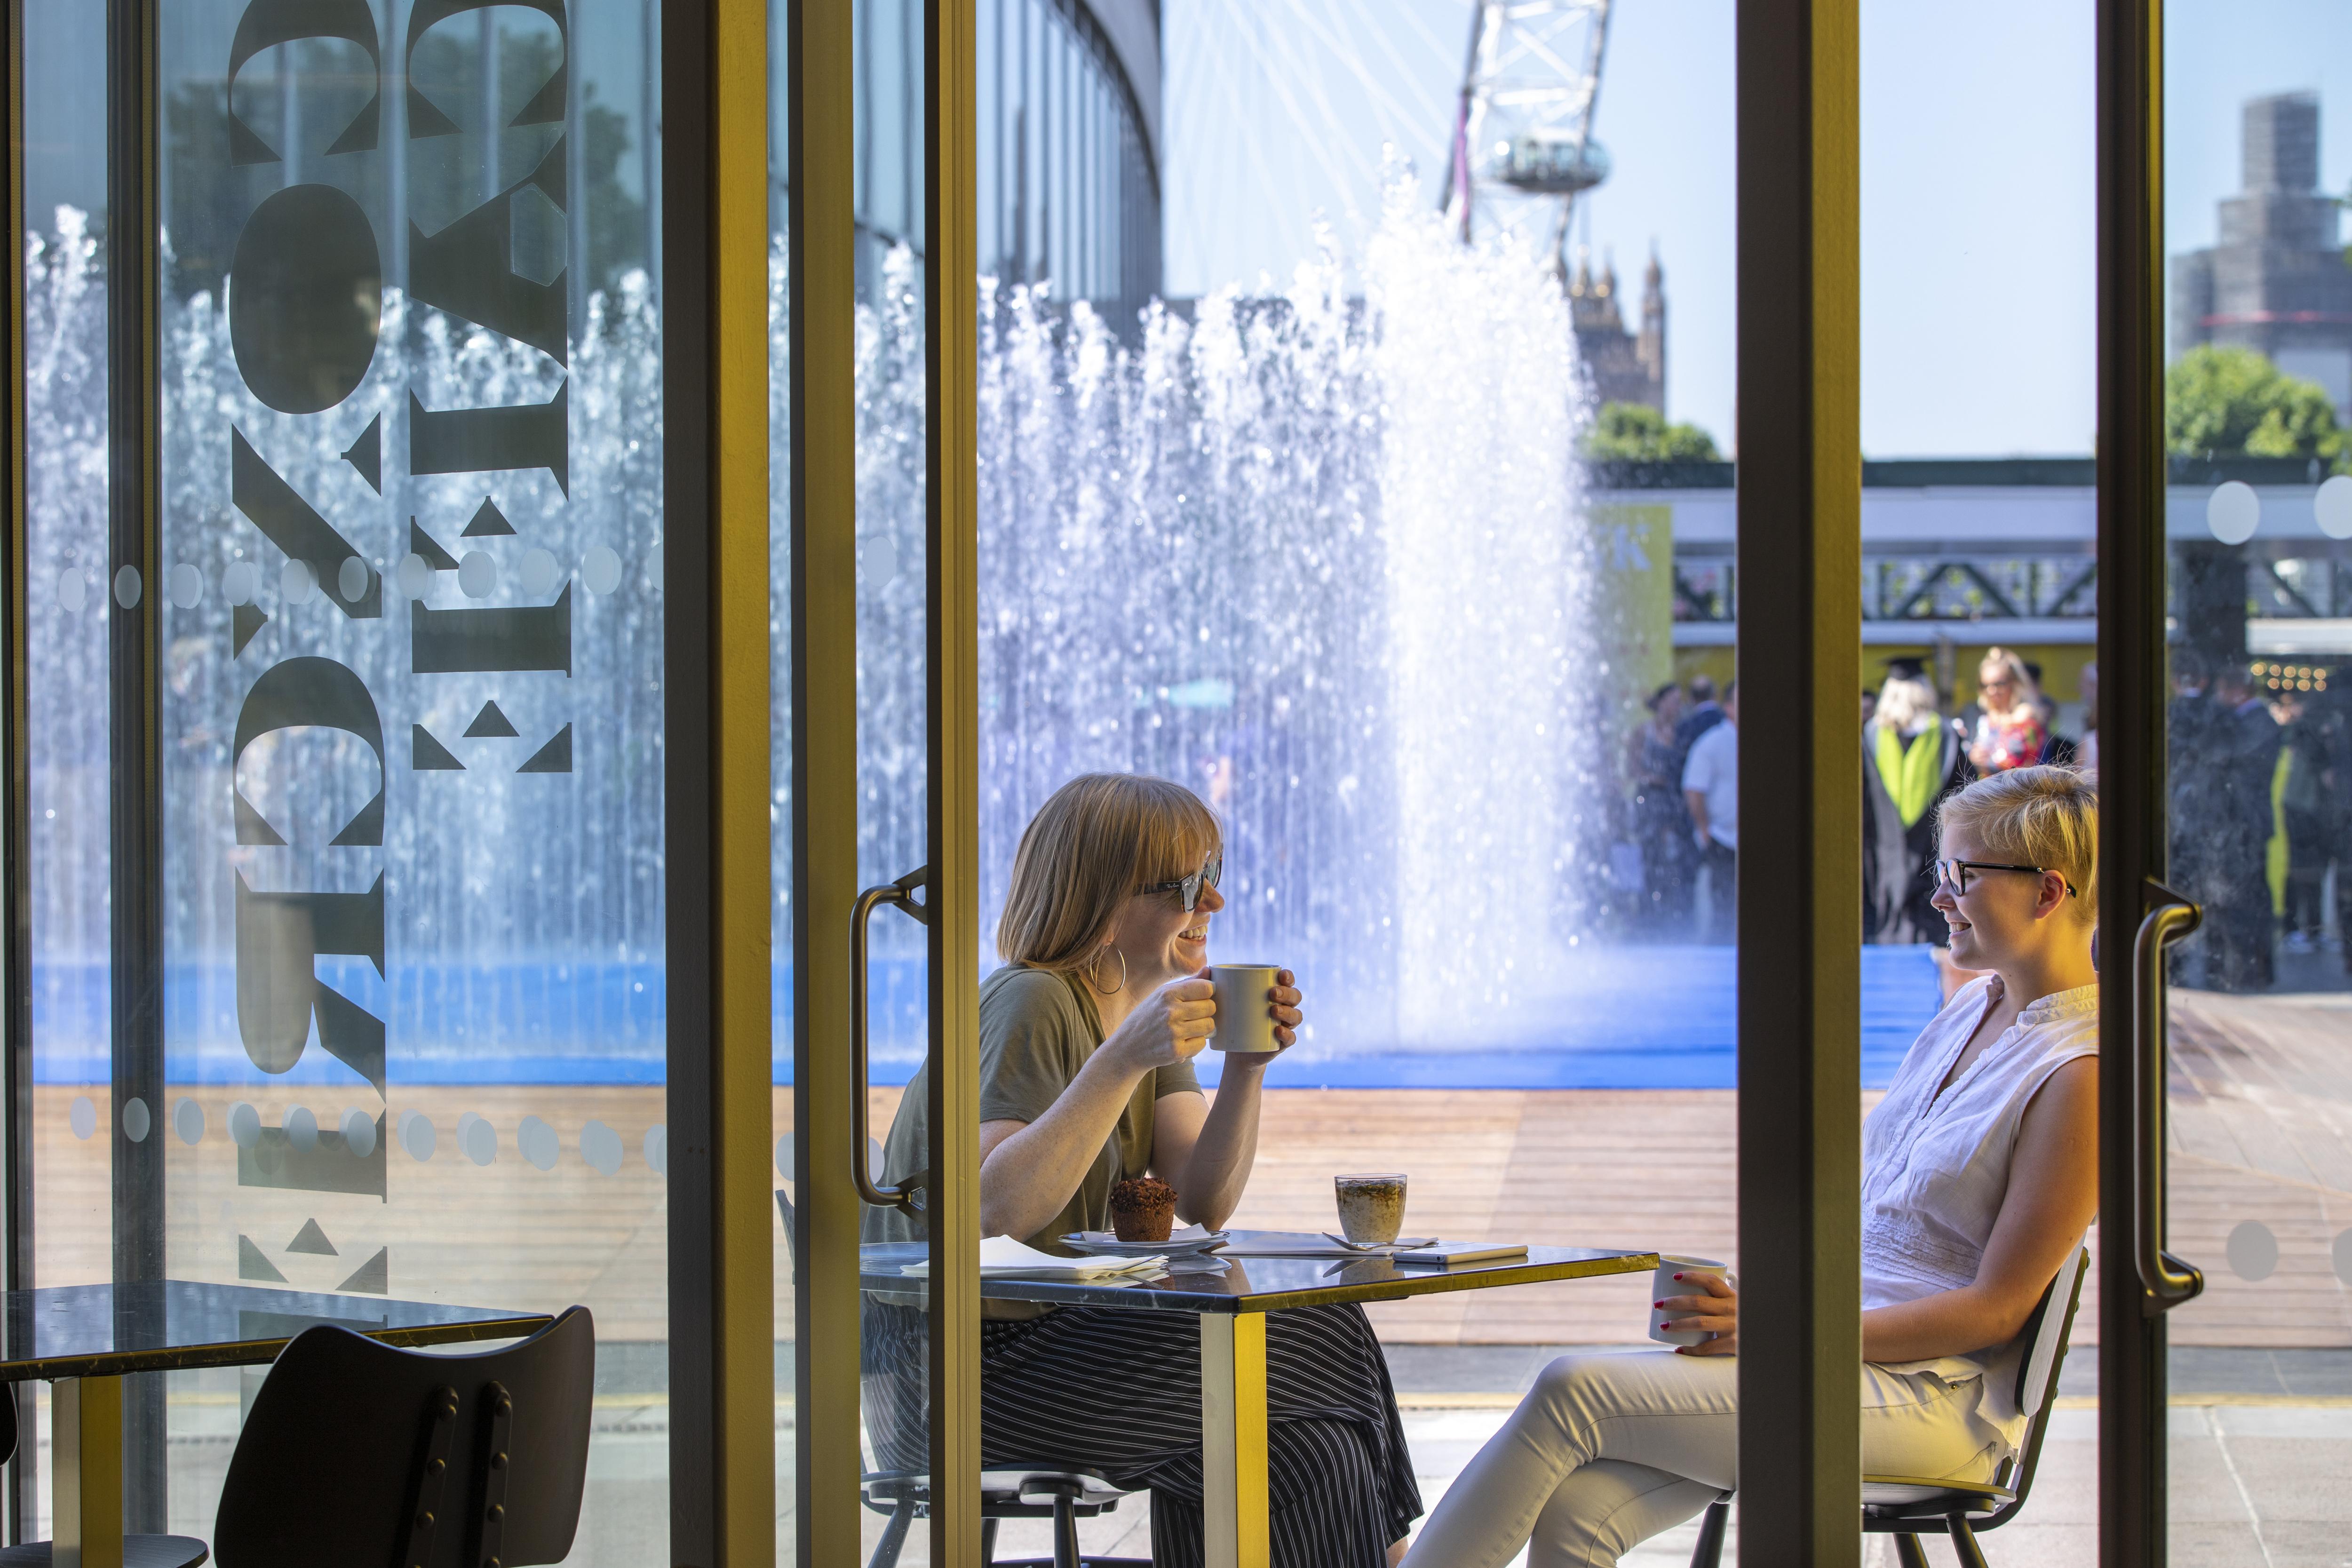 Family enjoying drinks at Concrete cafe